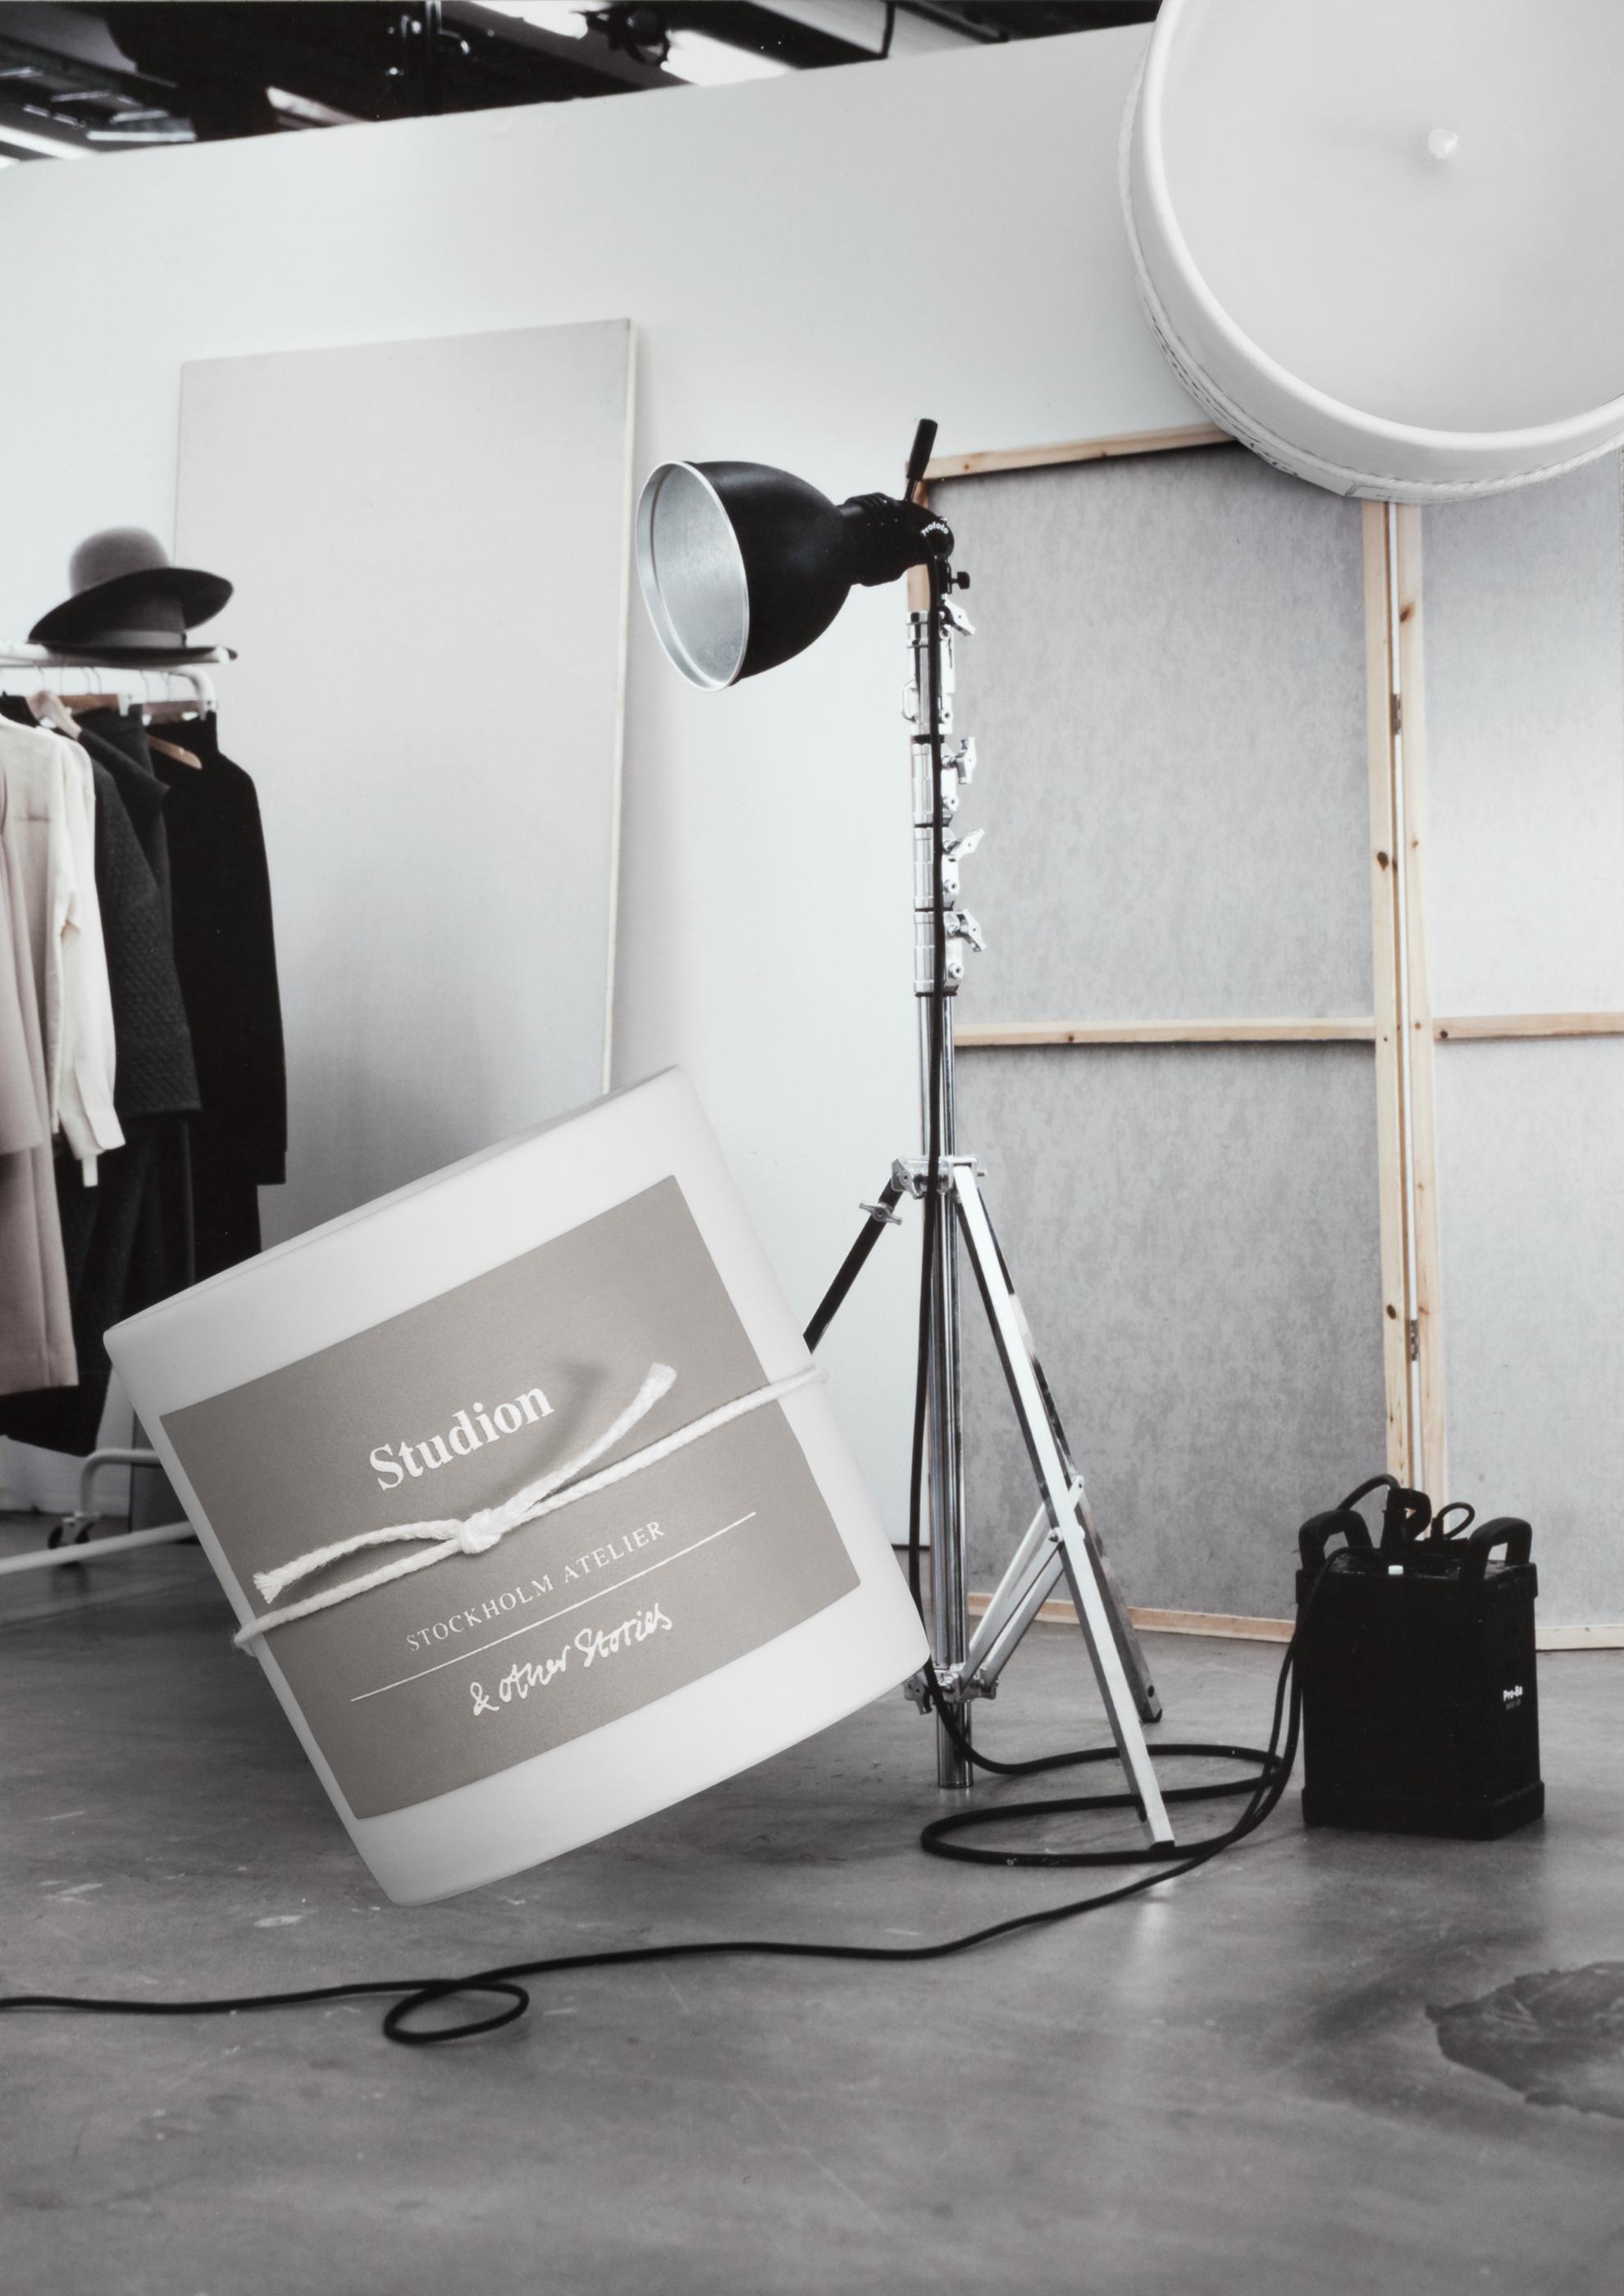 Studion_MoodImage_Stories.jpg